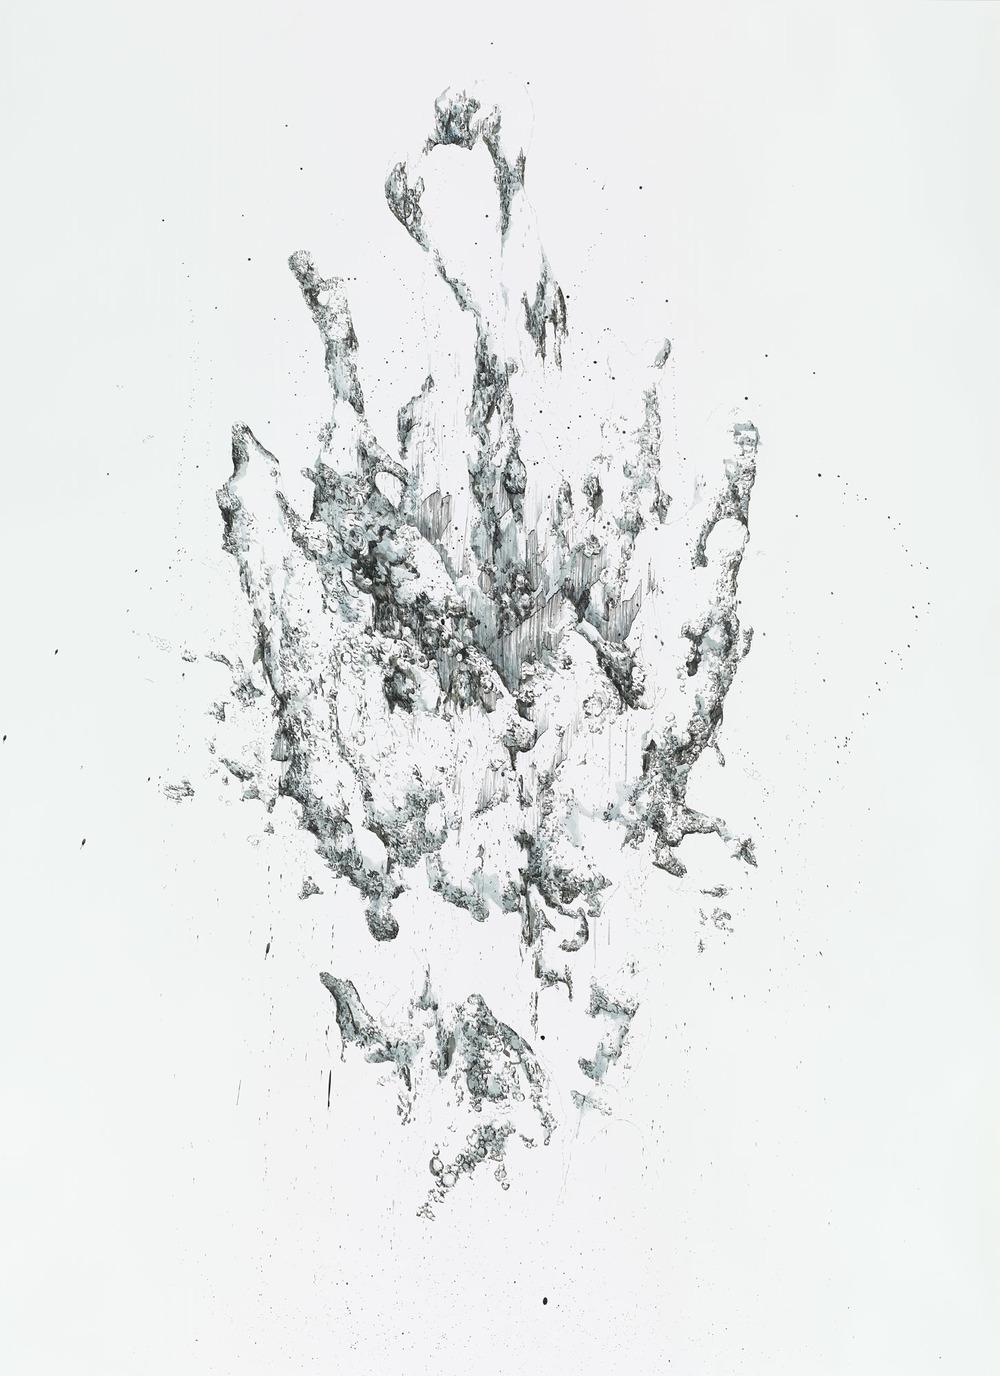 BK P164 | ink on paper | 150x200cm | 2014